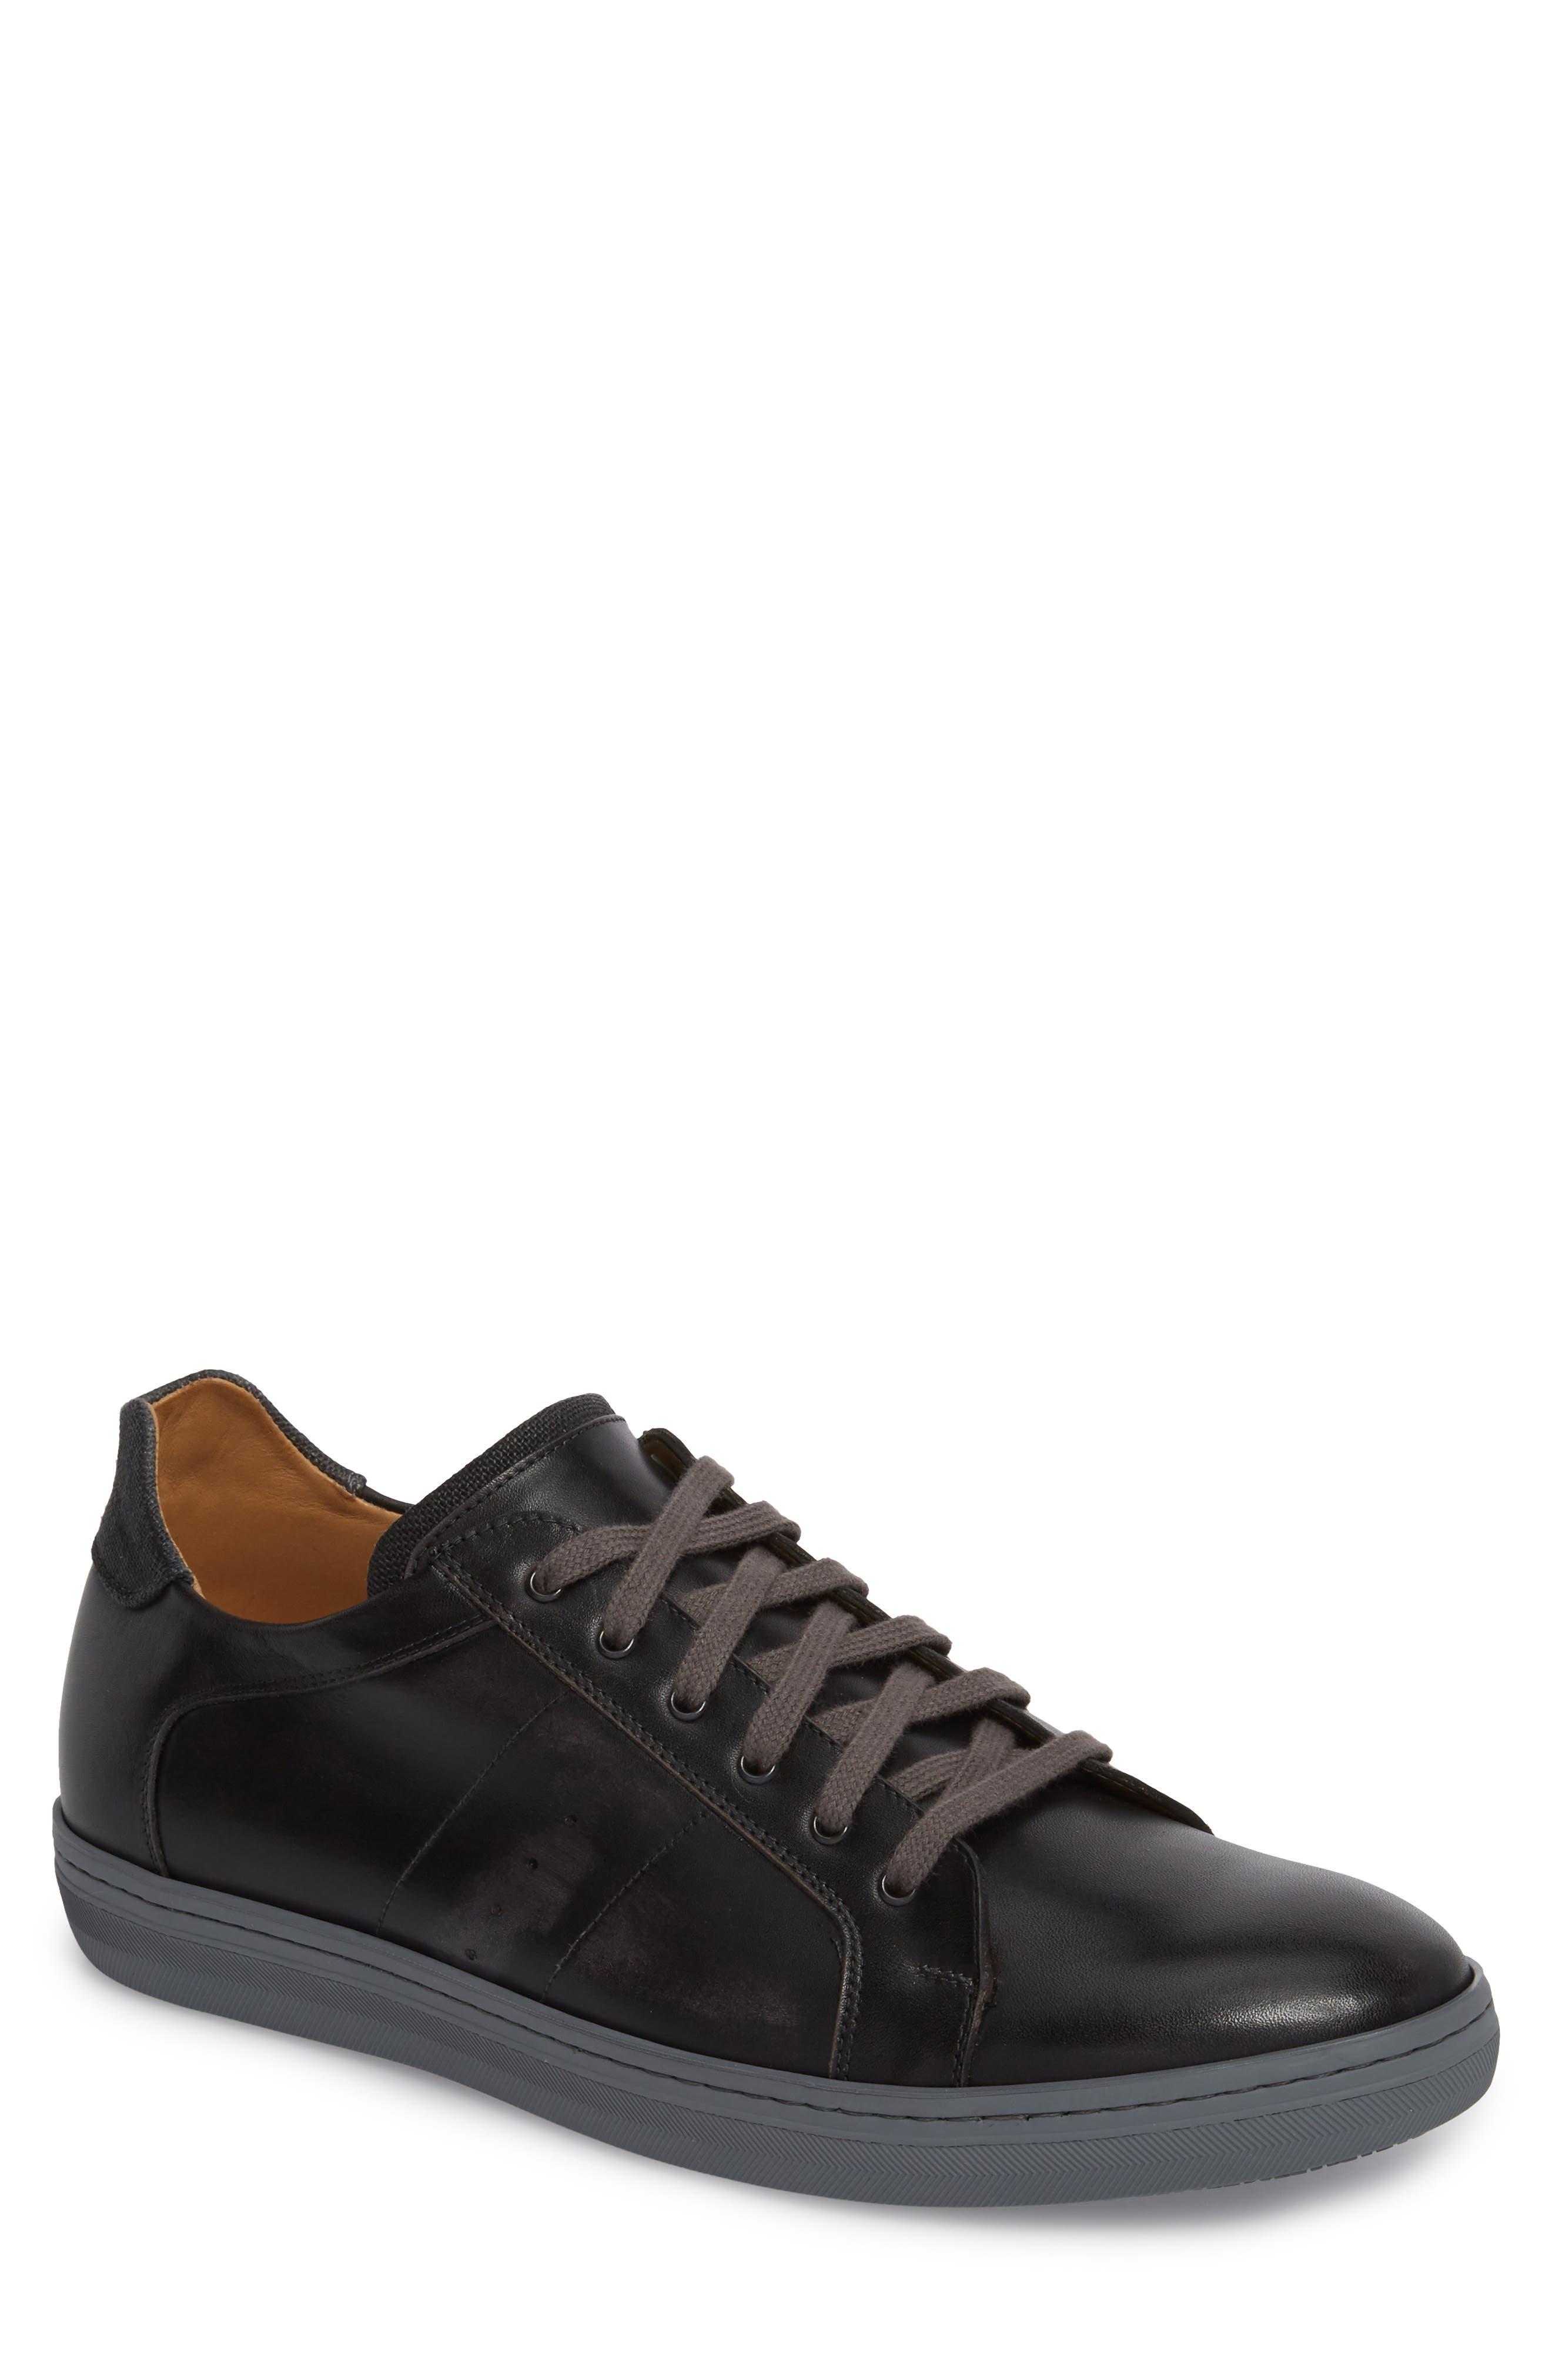 Mezlan Cuzco Sneaker (Men)